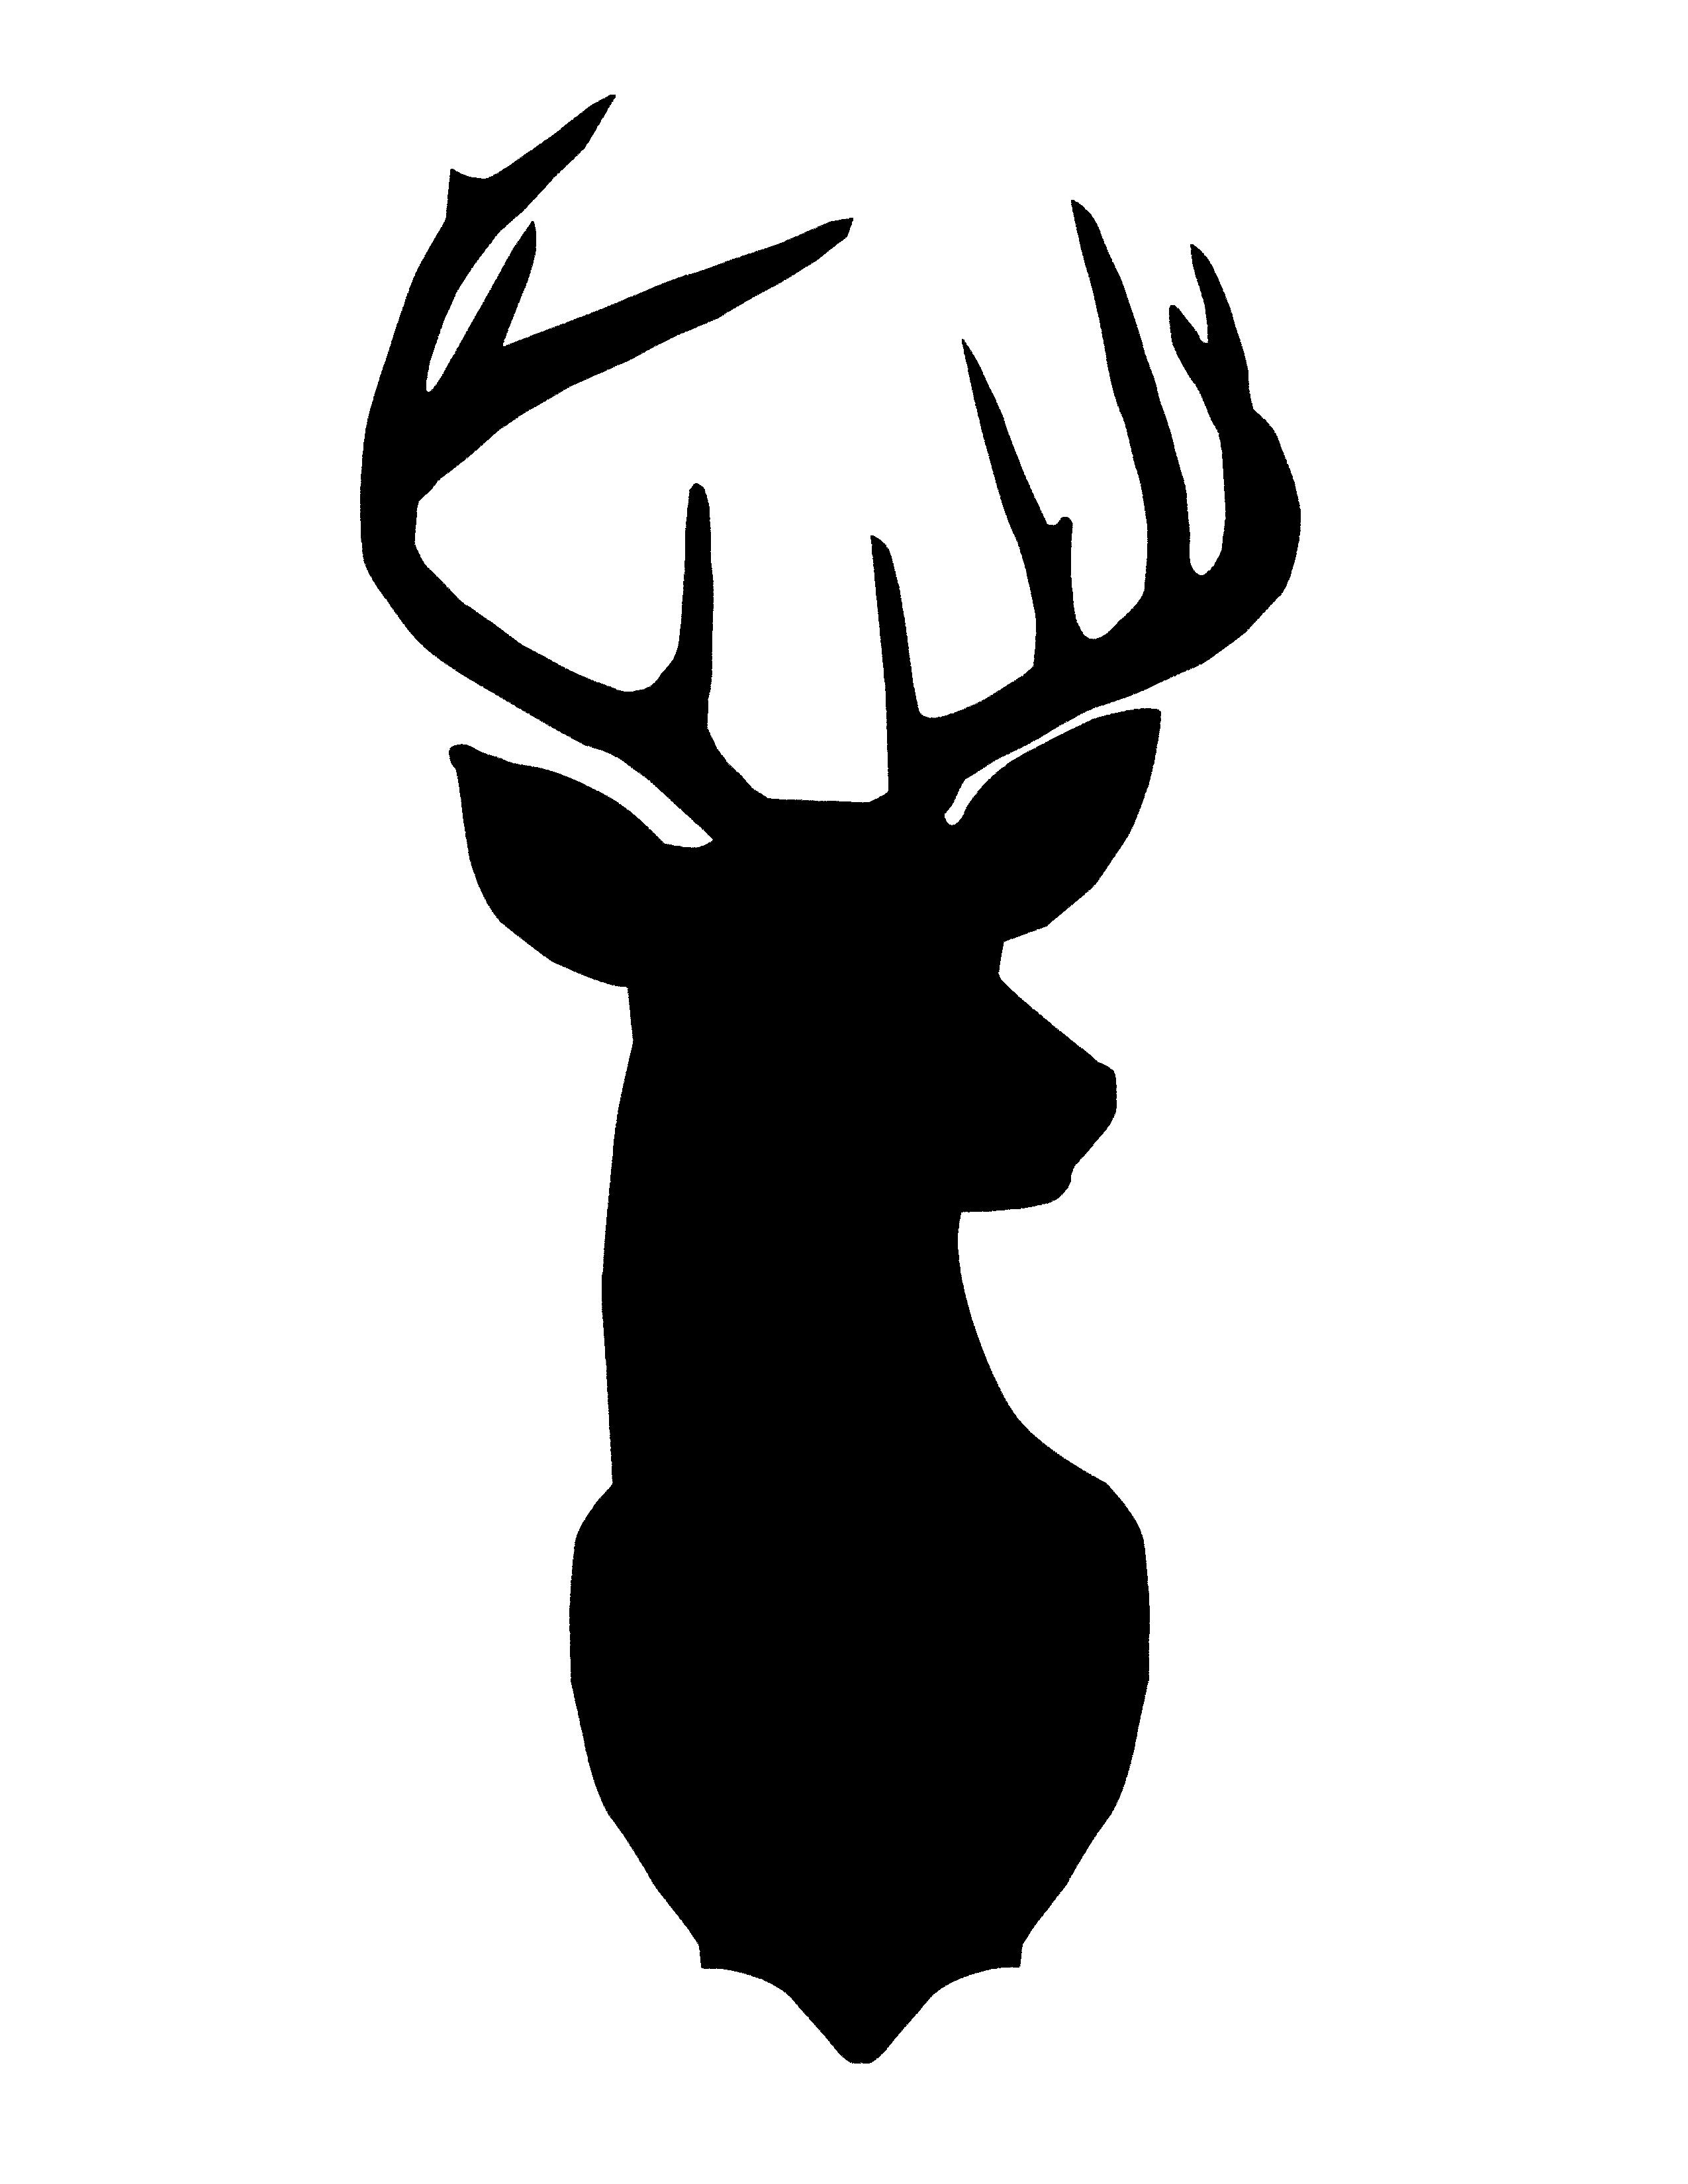 Reindeer silhouette clipart free jpg black and white Deer Clipart Free   Free download best Deer Clipart Free on ... jpg black and white